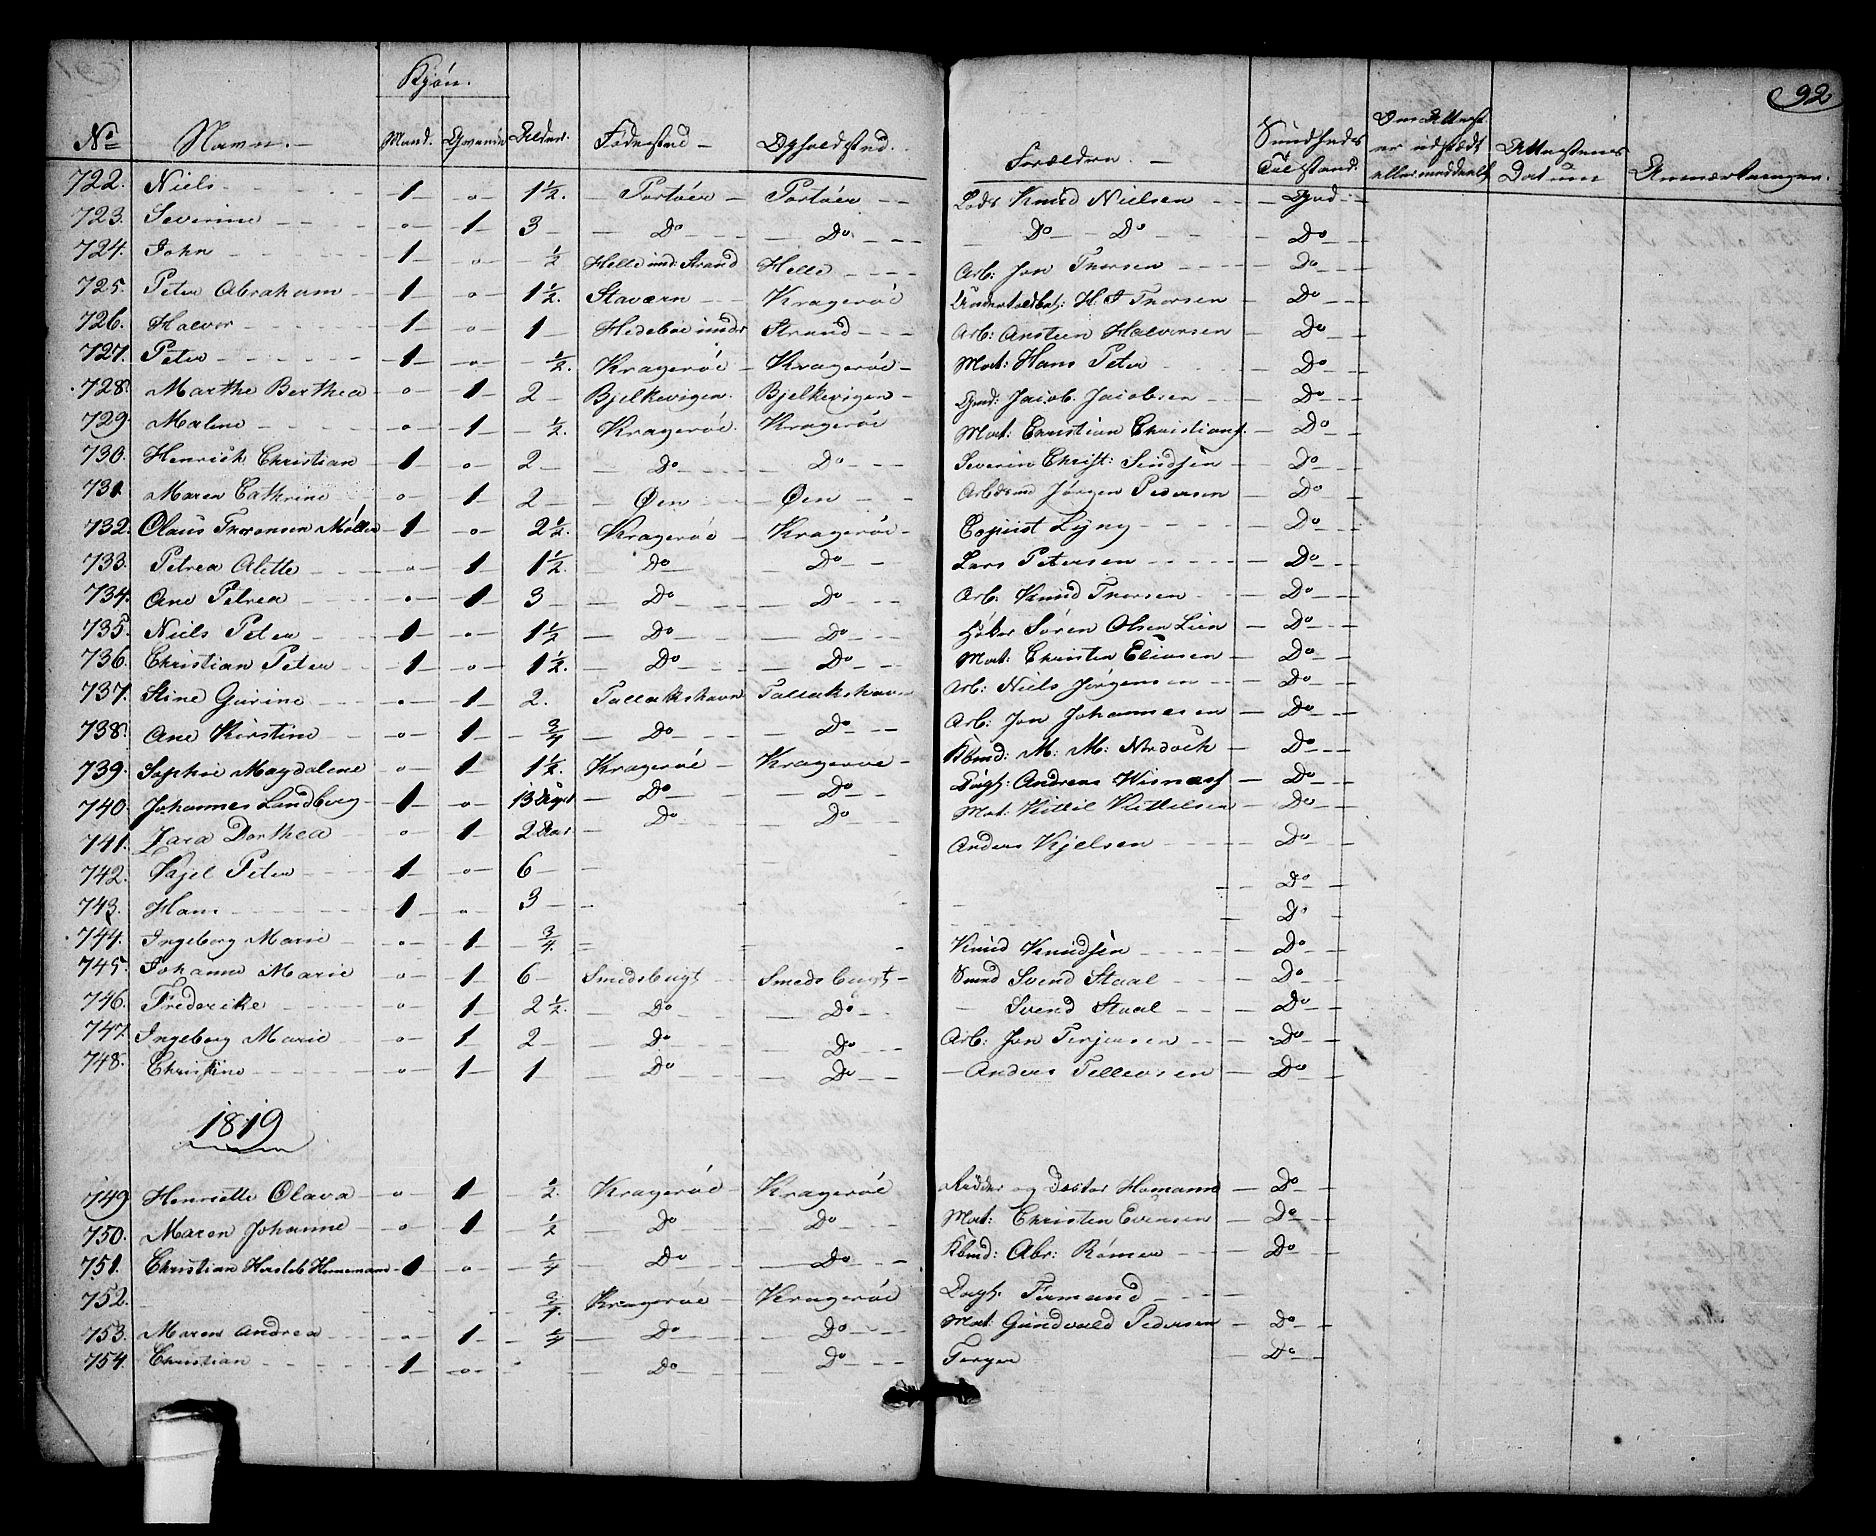 SAKO, Kragerø kirkebøker, F/Fa/L0003: Ministerialbok nr. 3, 1802-1813, s. 92